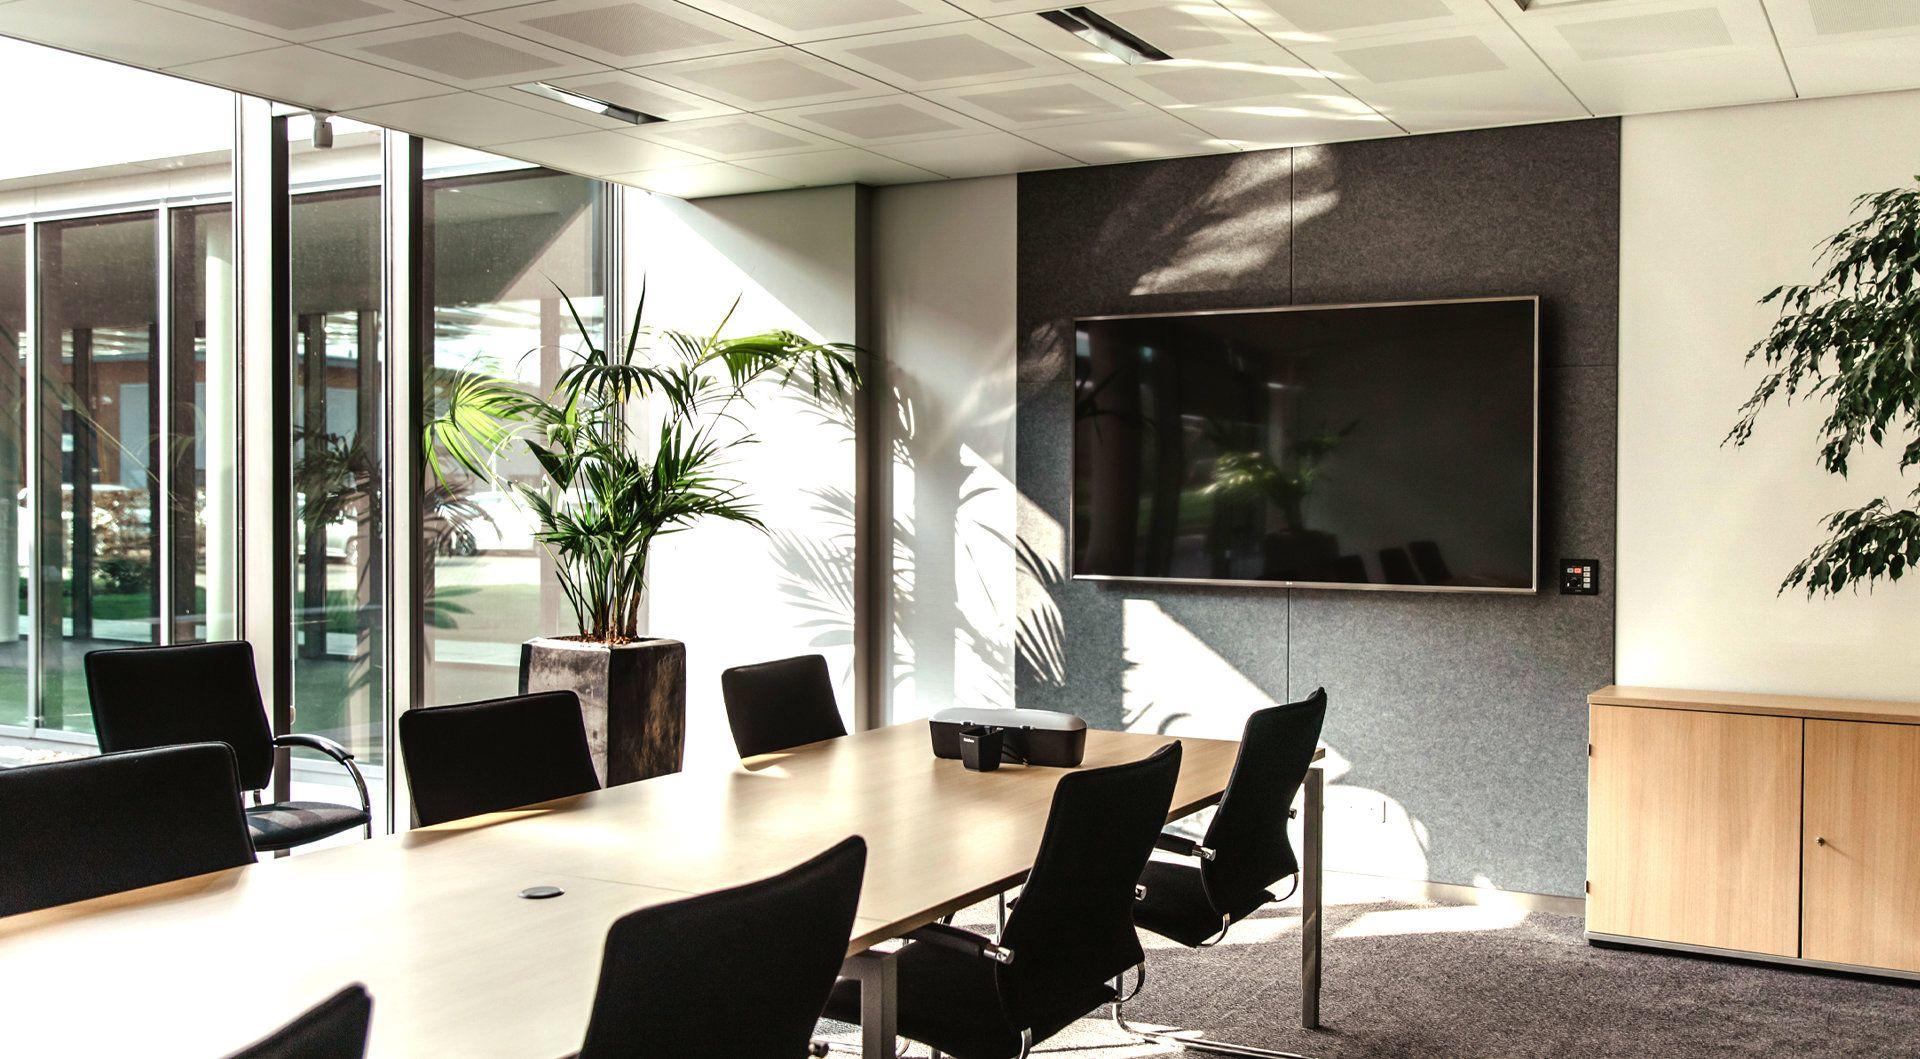 "LG 43UH5F beeldkrant 109,2 cm (43"") IPS 4K Ultra HD Digitale signage flatscreen Zwart - Case studie de vries"